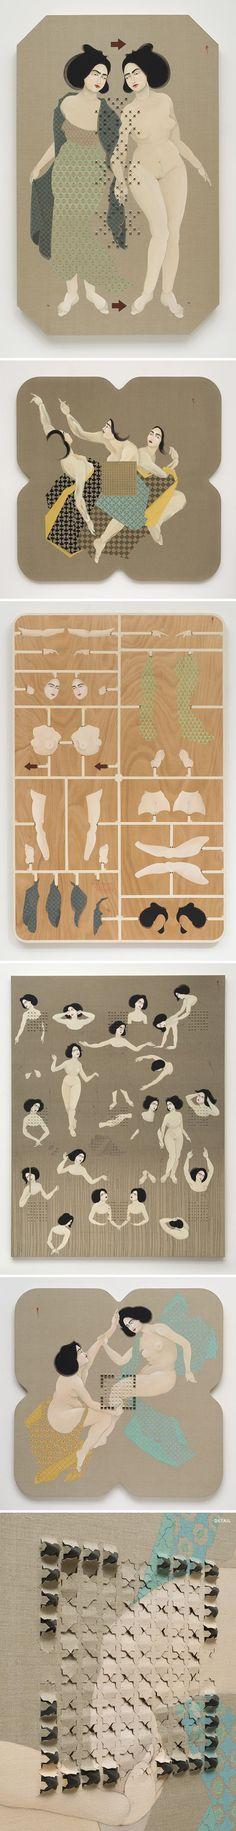 The Jealous Curator /// curated contemporary art /// hayv kahraman